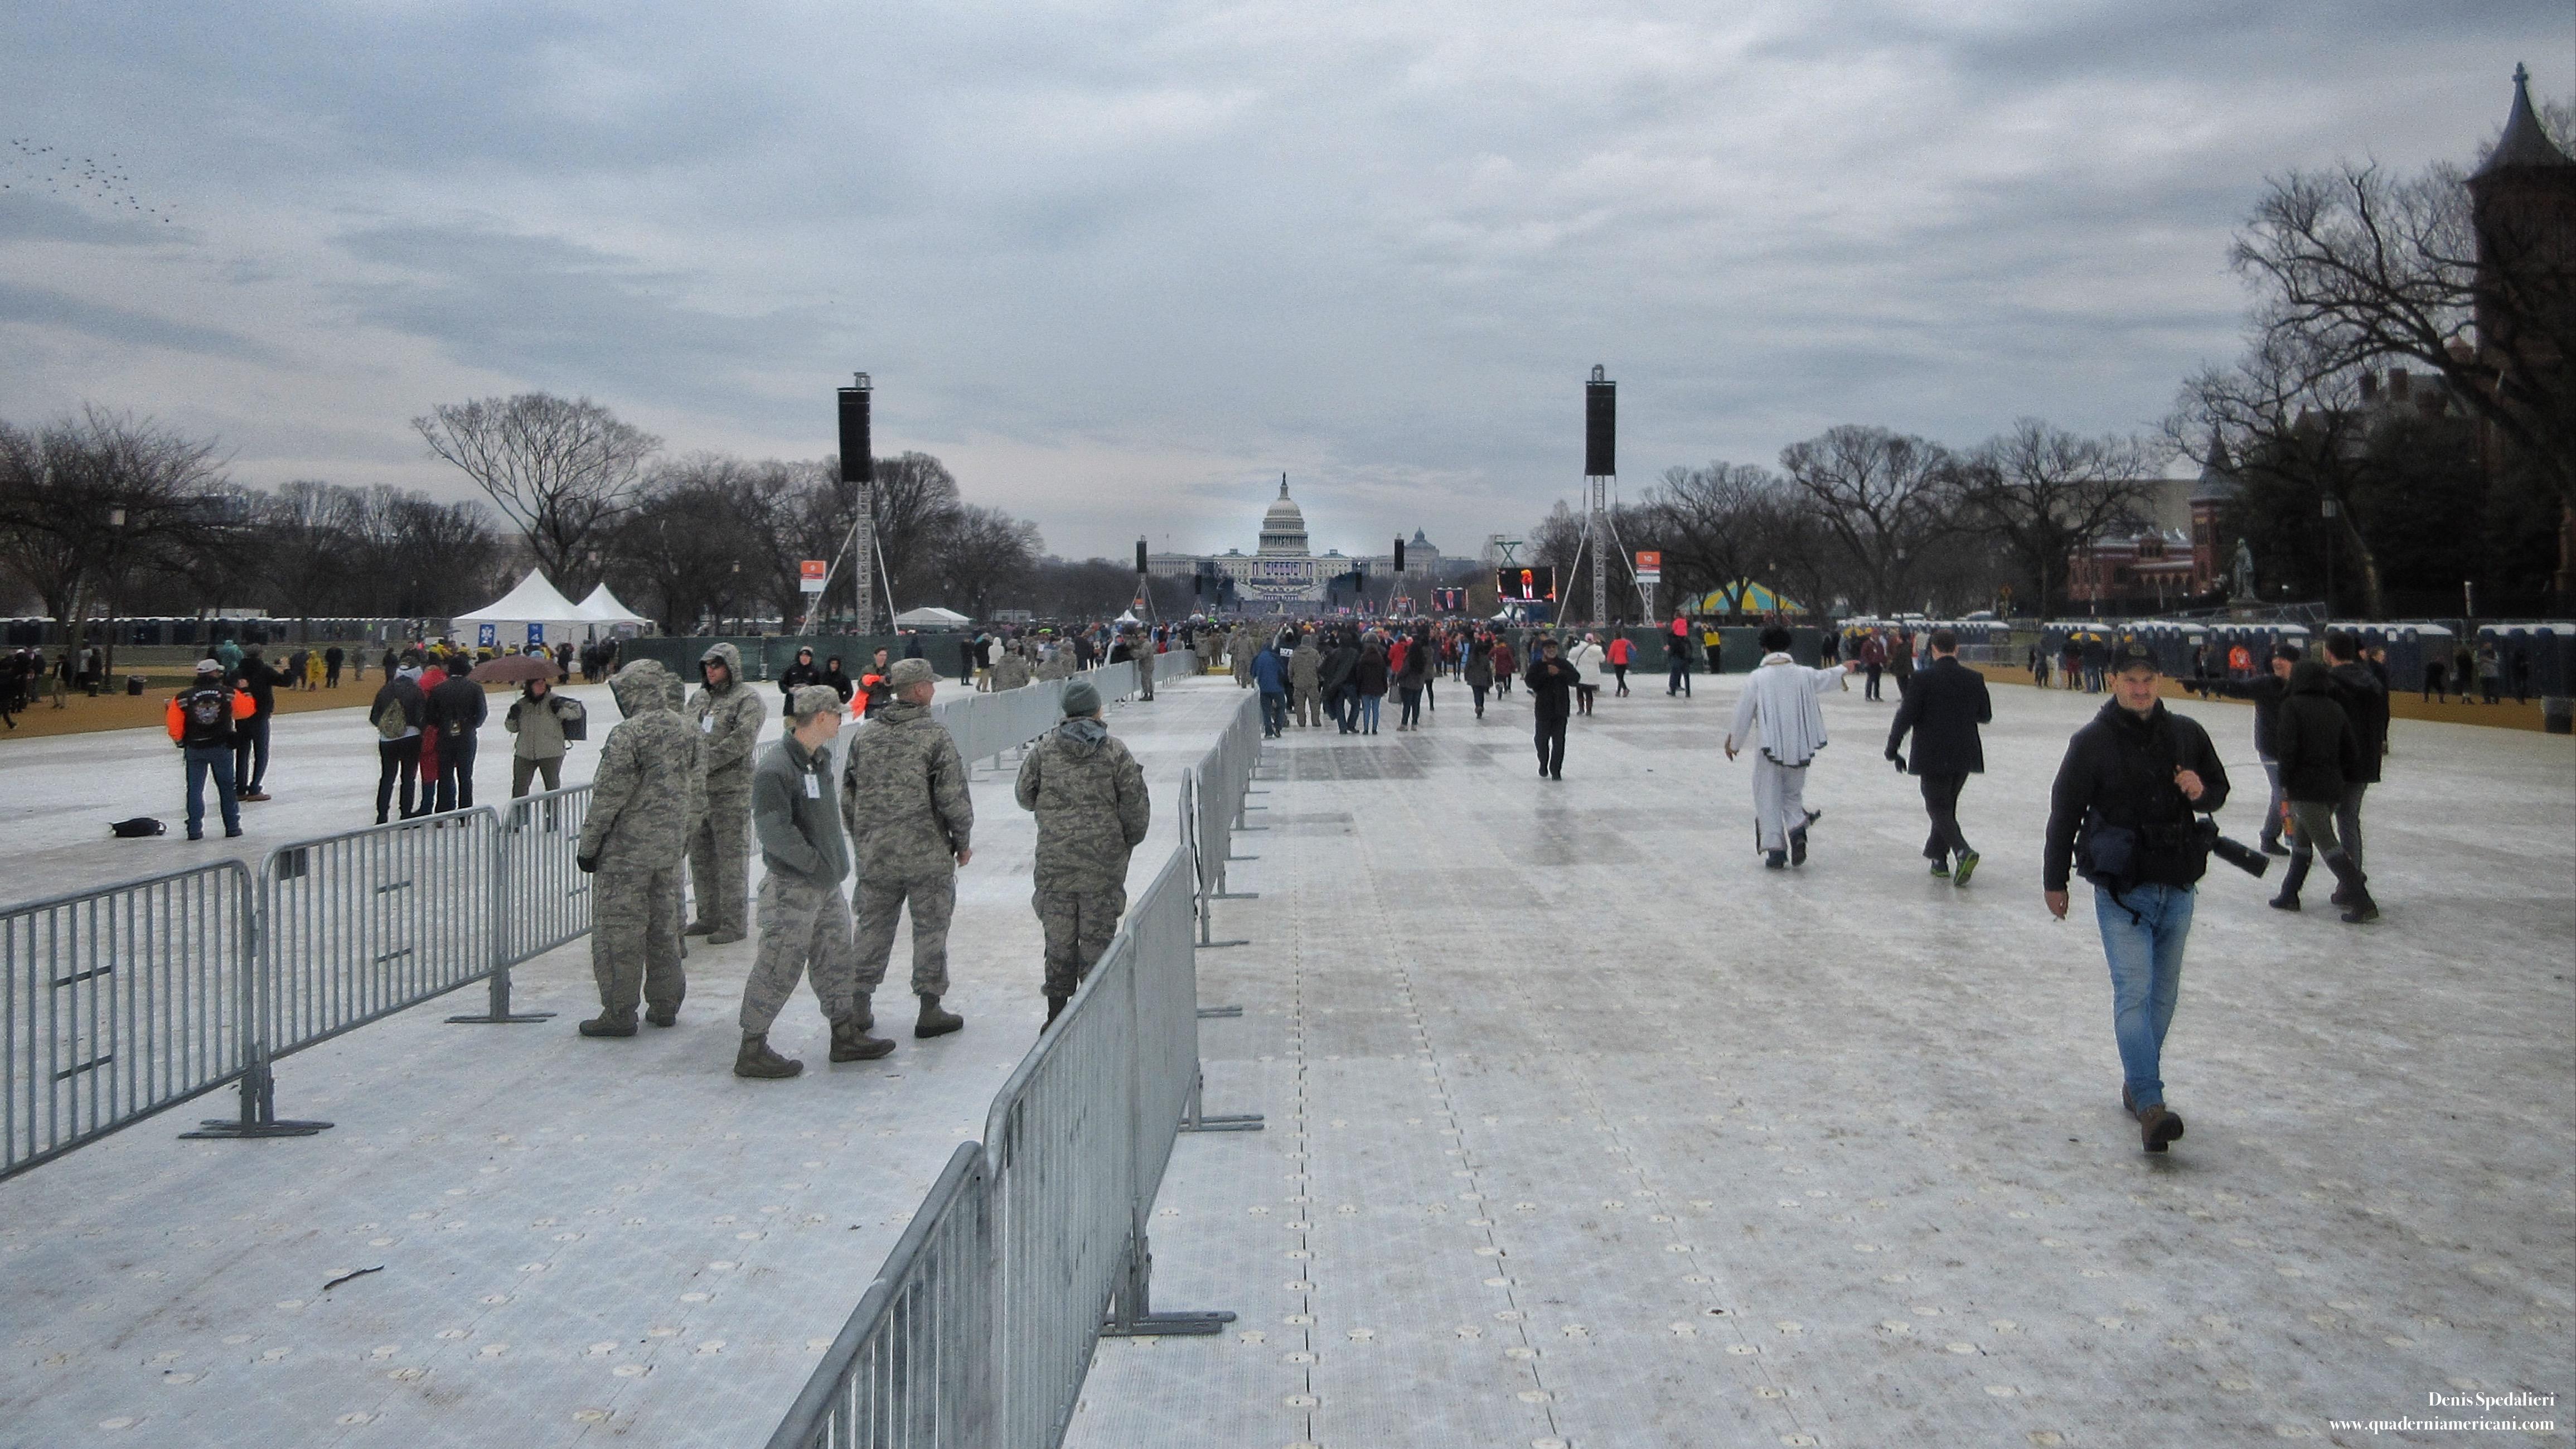 Washington, Trump, Inauguration Day, Inauguration Day 2017, Alternative Facts, National Mall